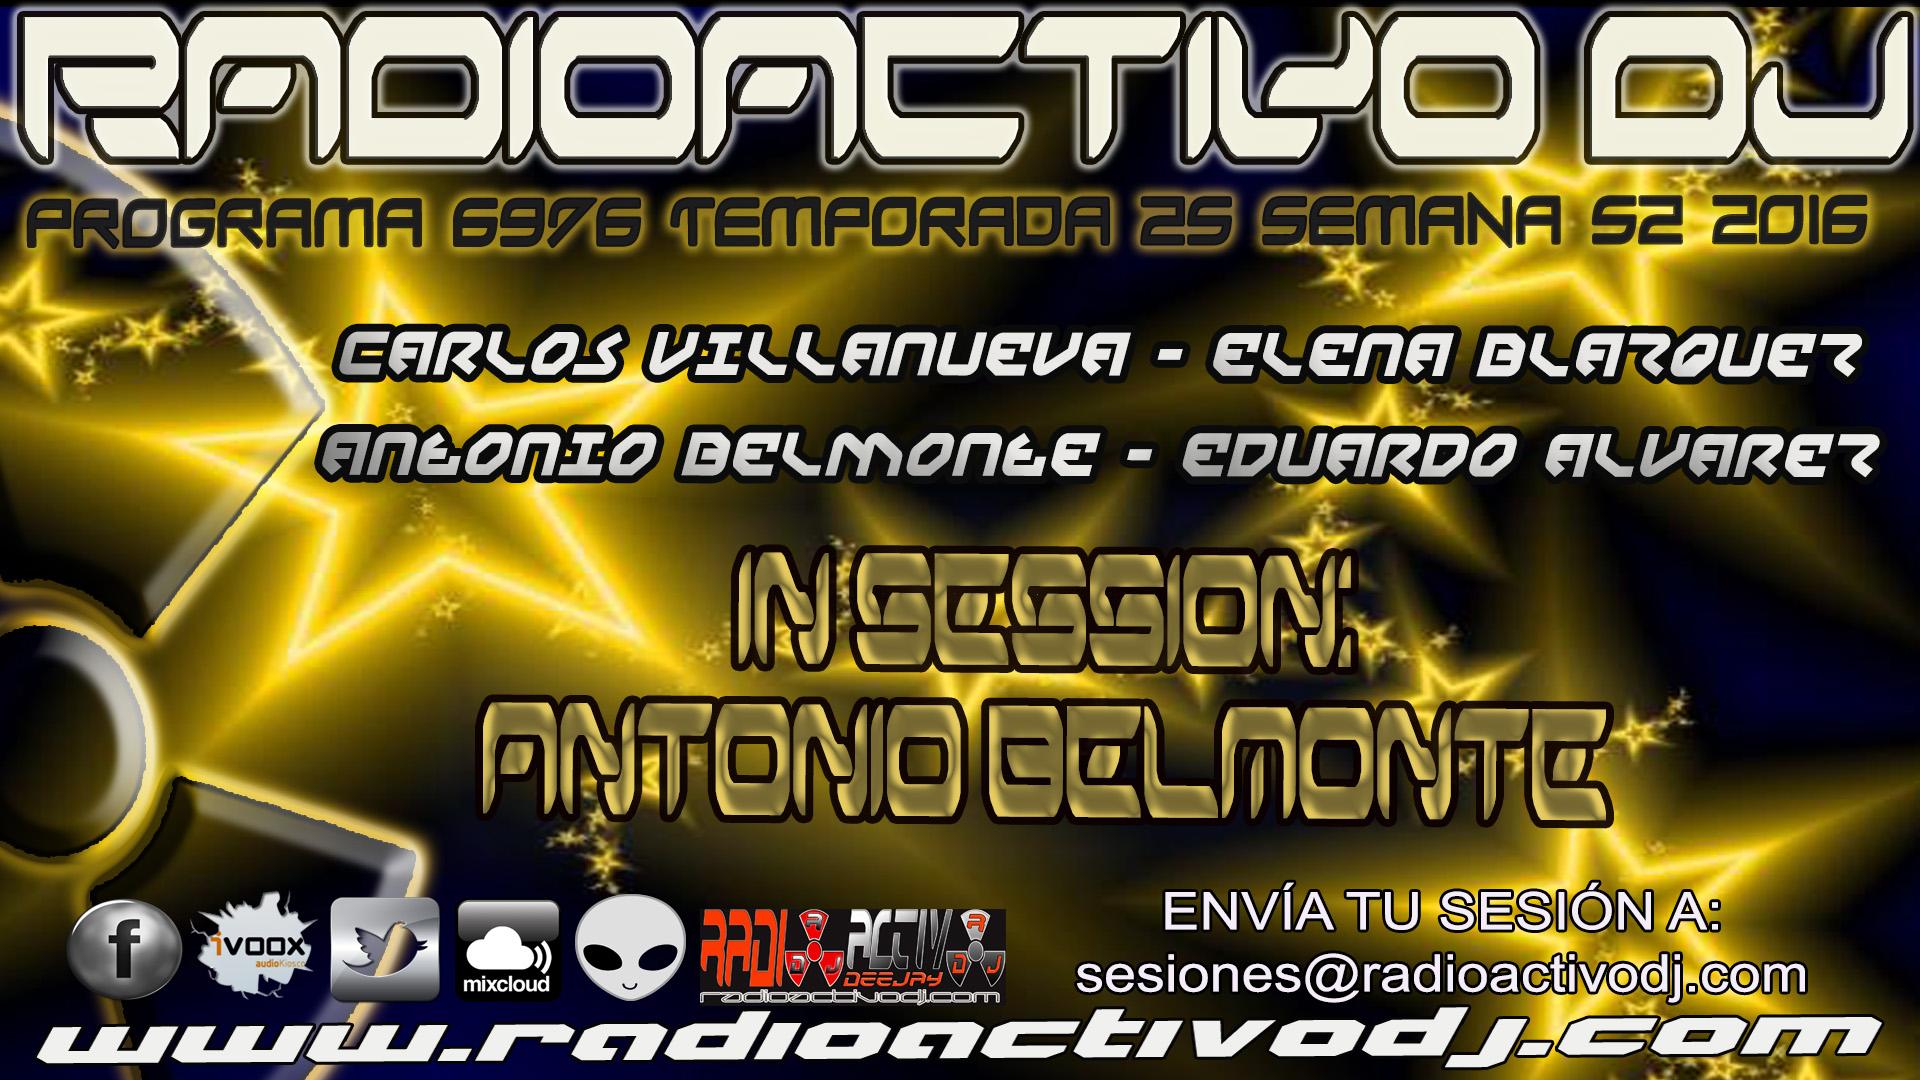 RADIOACTIVO-DJ-52-2016